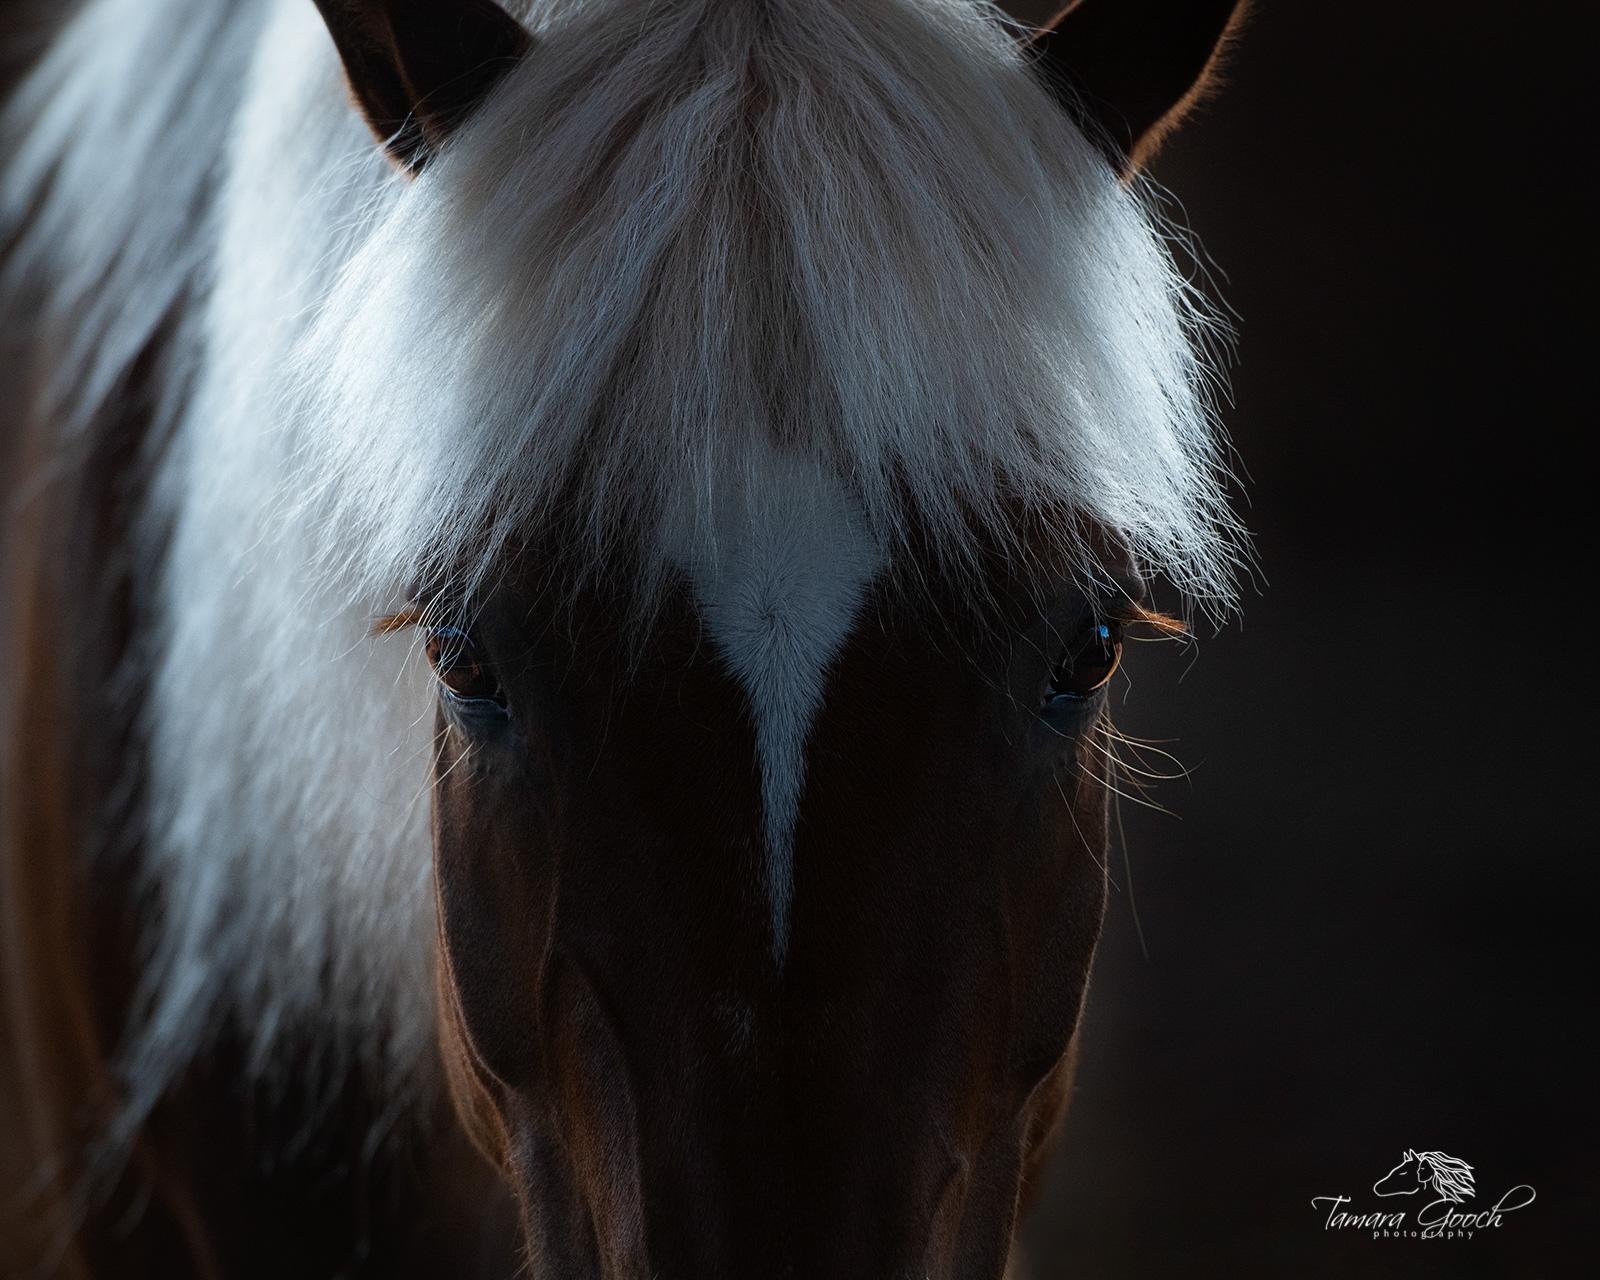 A horse portrait, head shot of a haflinger horse.